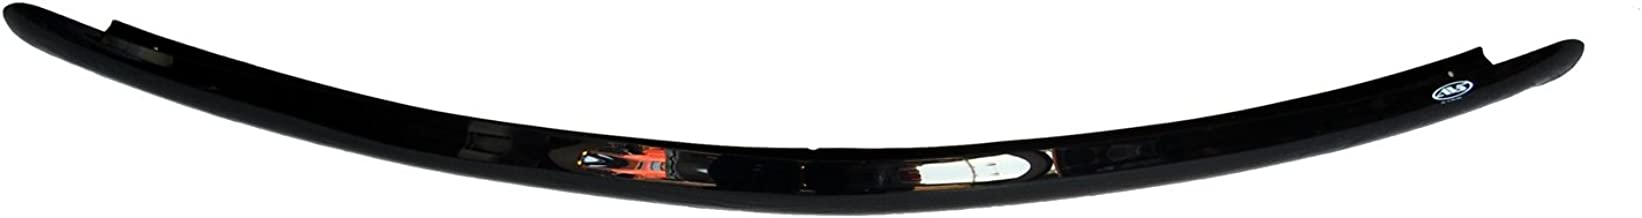 Auto Ventshade AVS 21936 Hoodflector Dark Smoke Hood Shield for 2000-2006 Chevrolet Tahoe, Suburban 1500 & 2500, 1999-2002...